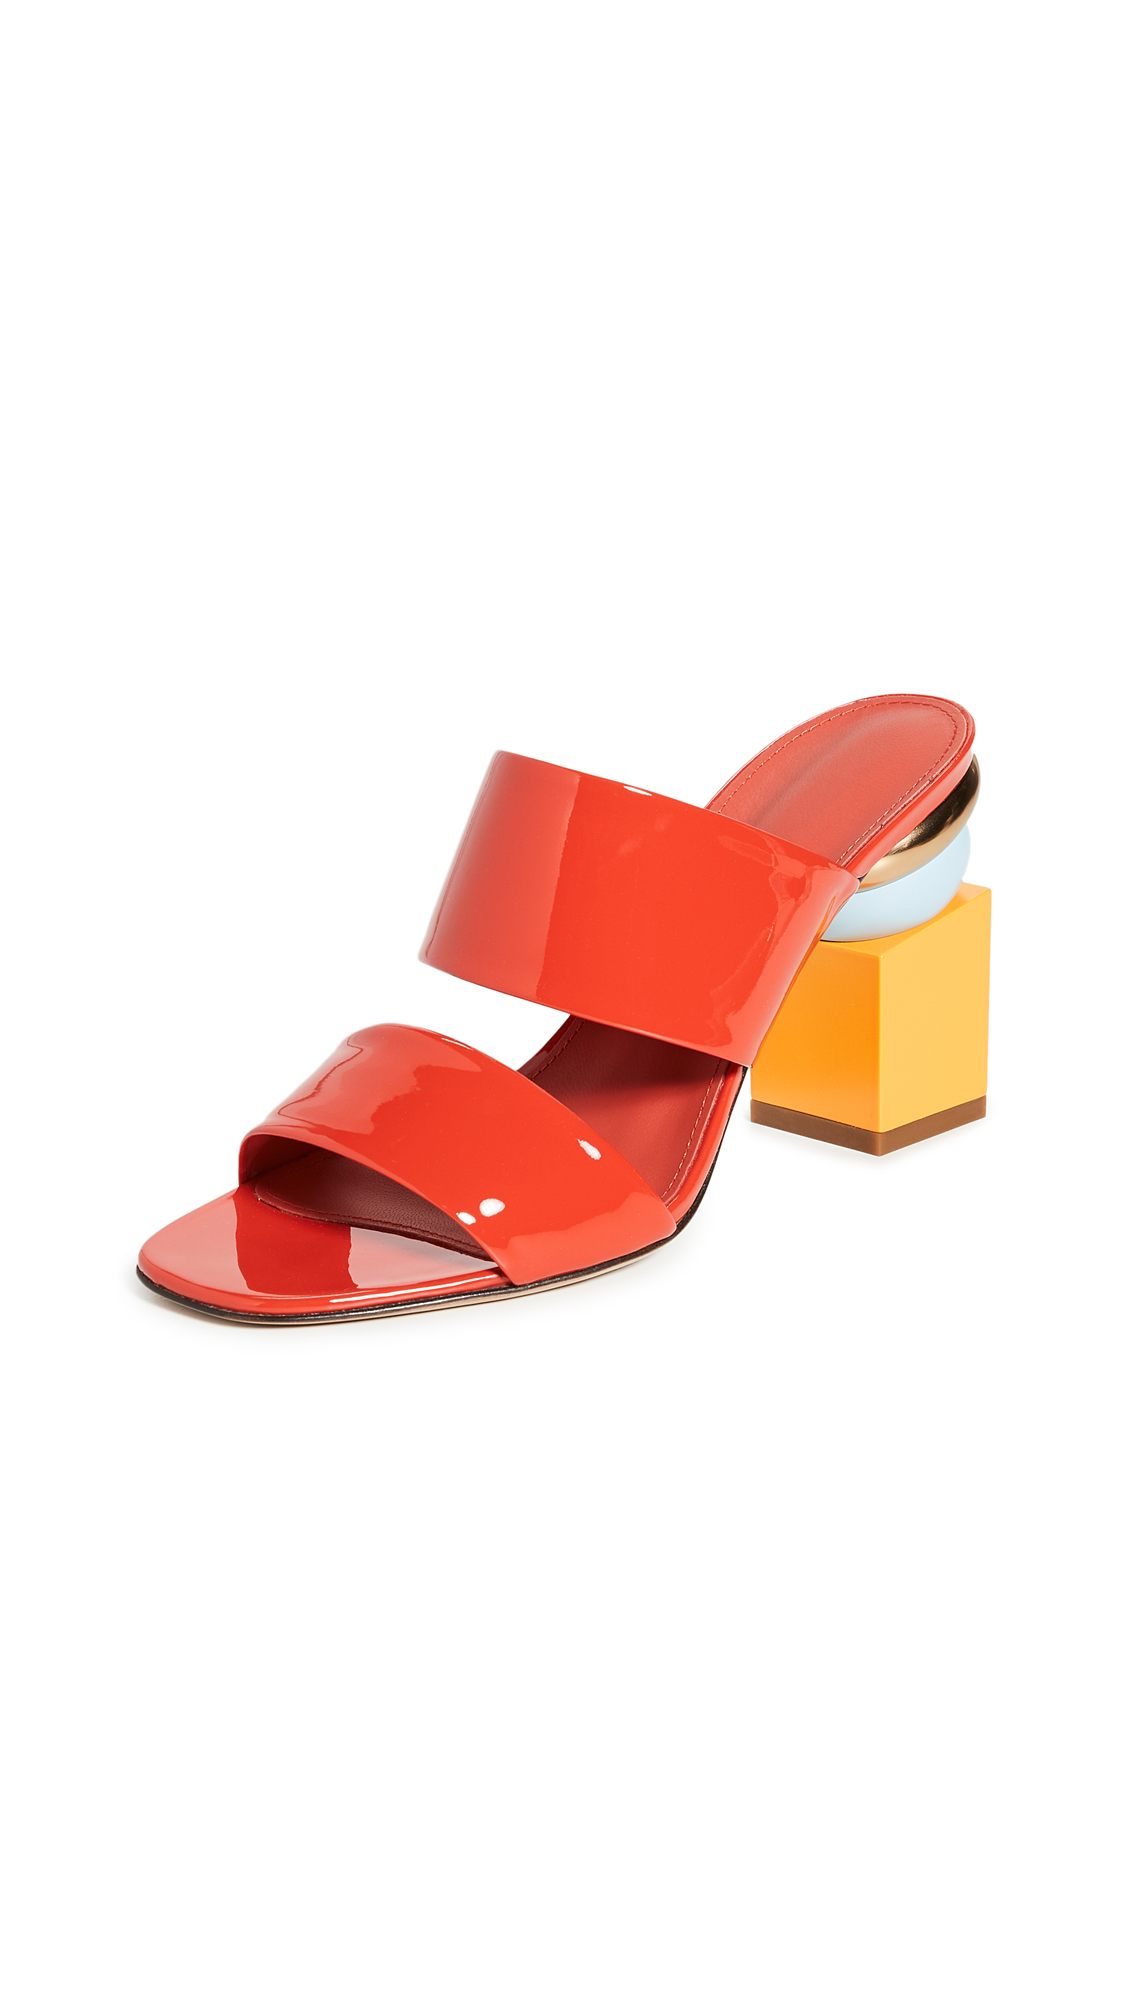 Buy Salvatore Ferragamo online - photo of Salvatore Ferragamo Lotten Sandals